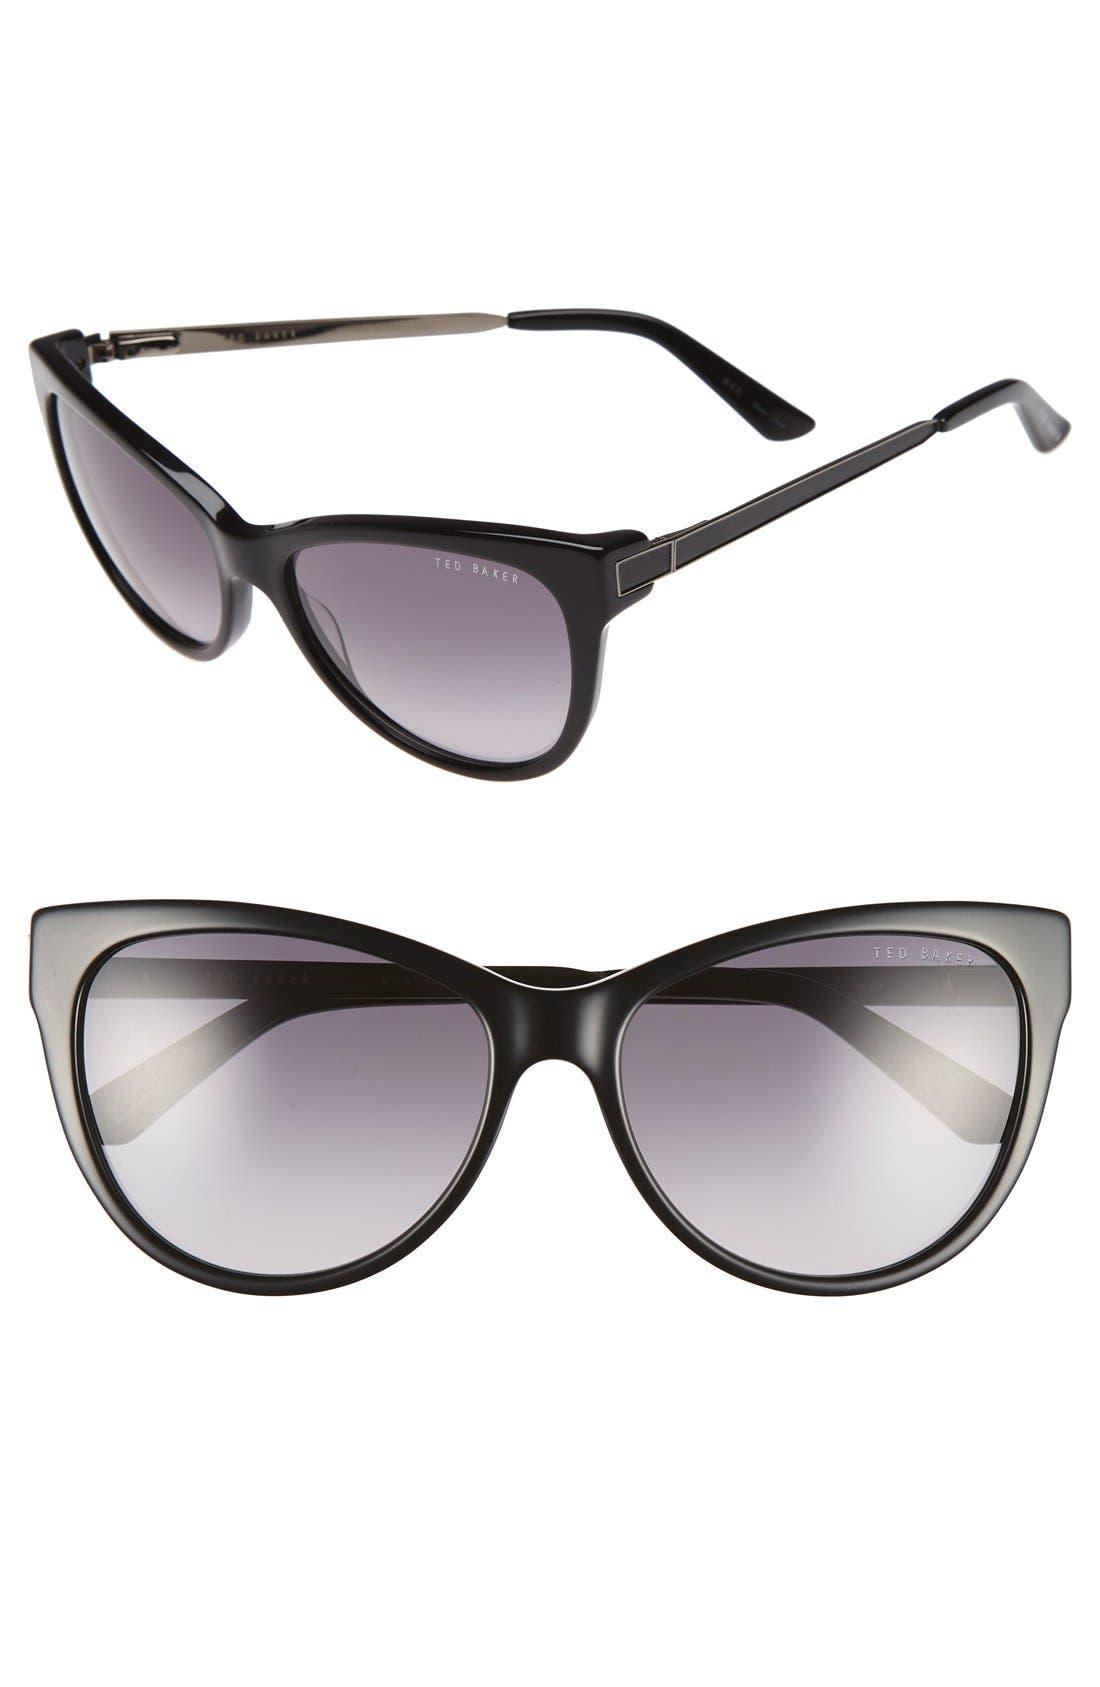 Main Image - Ted Baker London 57mm Cat Eye Sunglasses